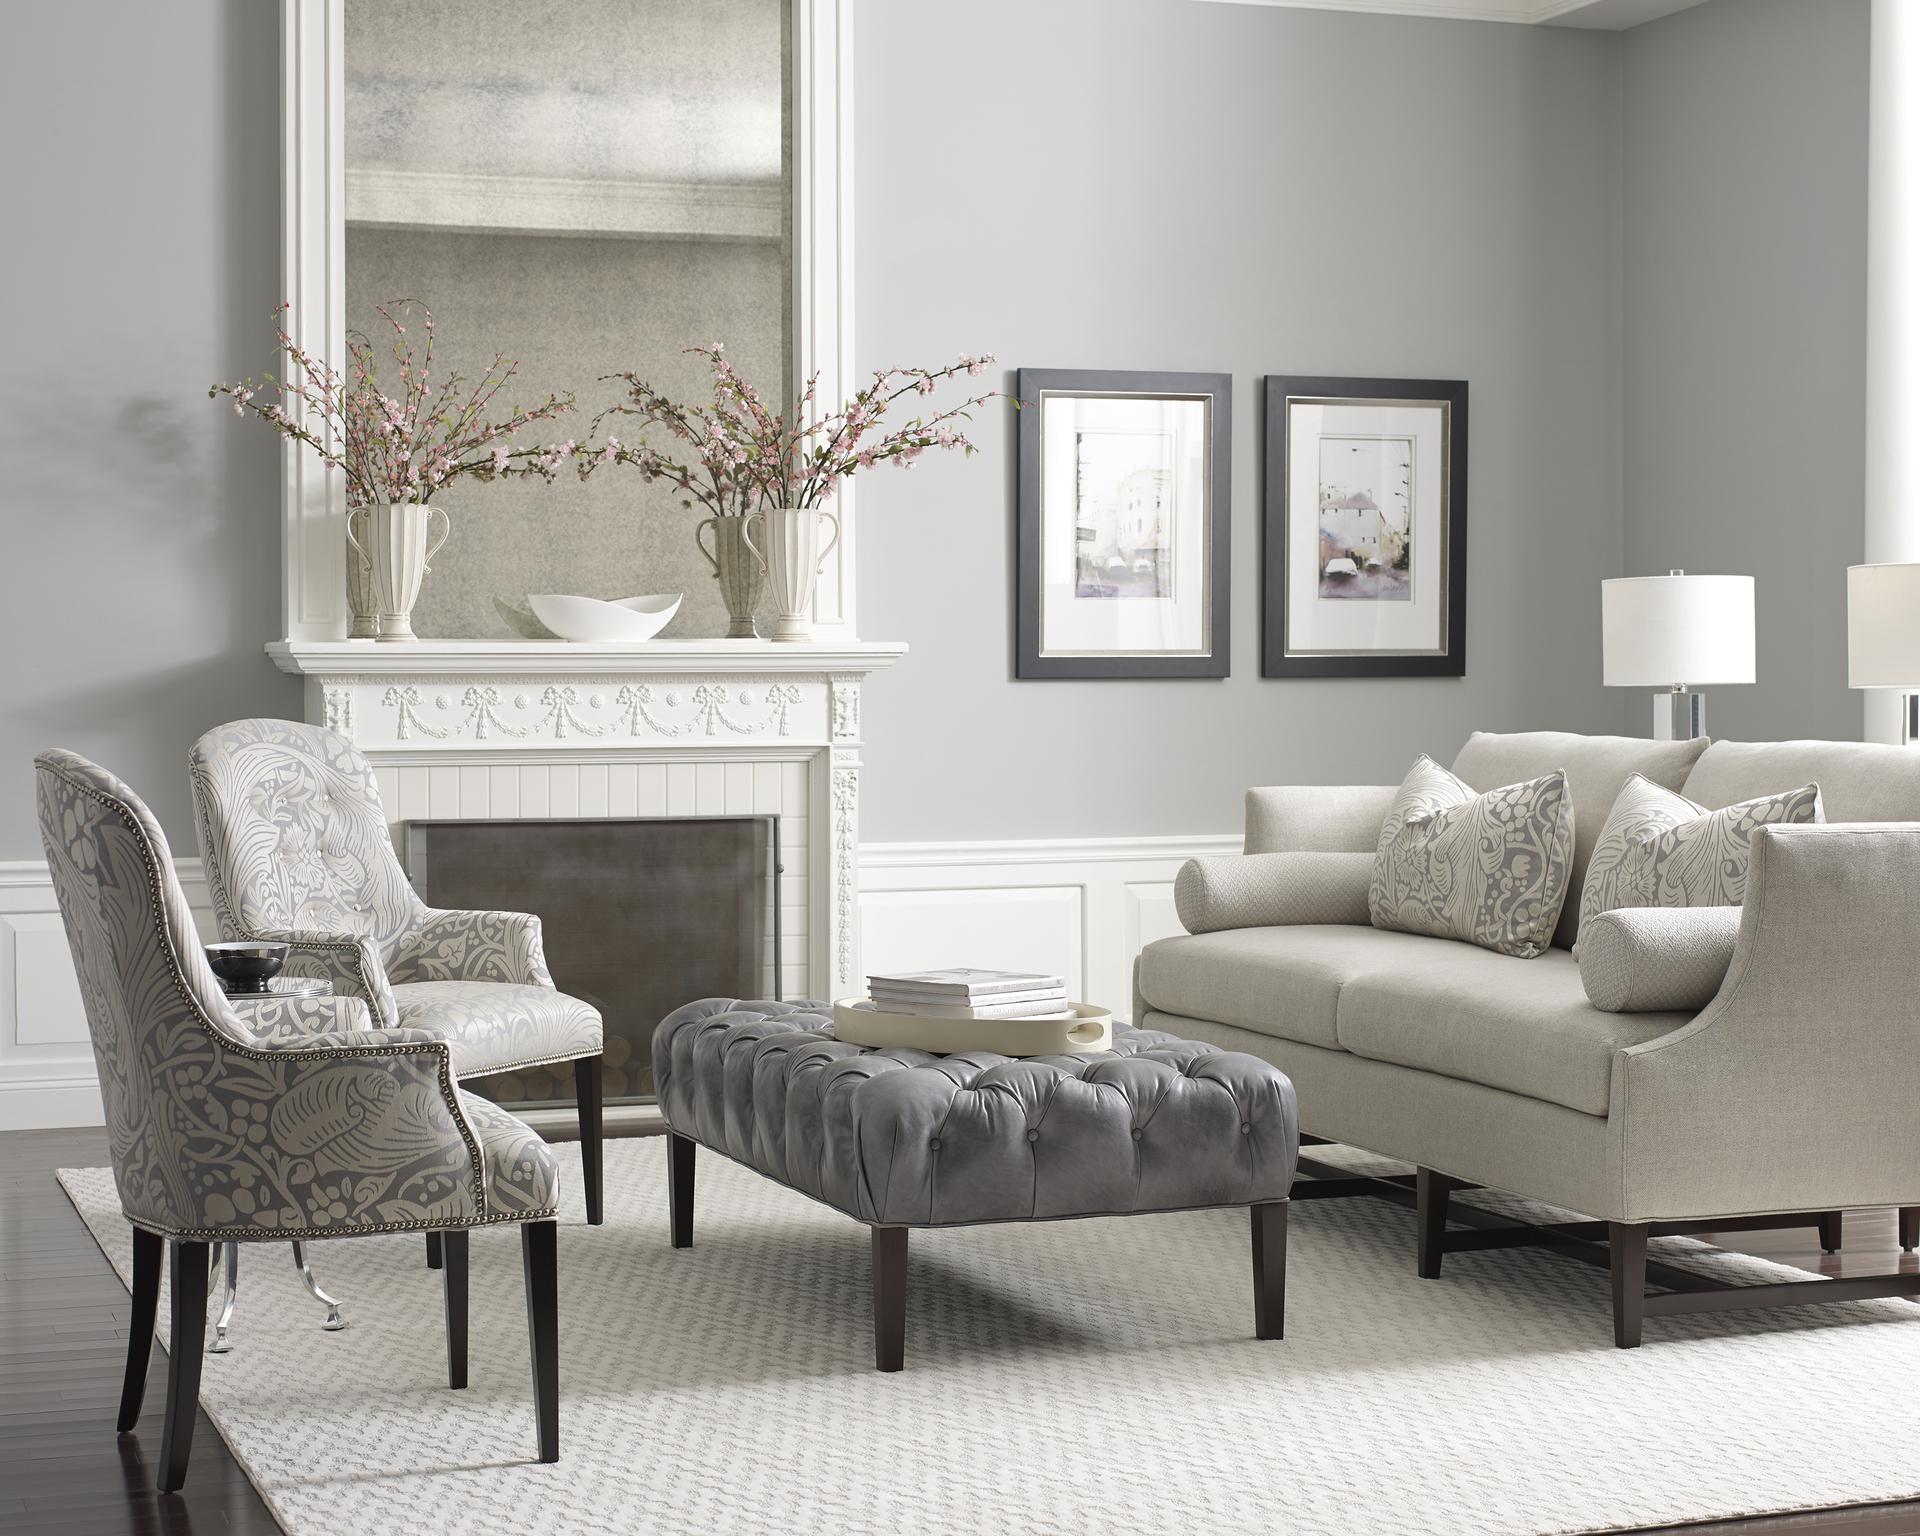 nyc interior design and interior designer for long island and florida